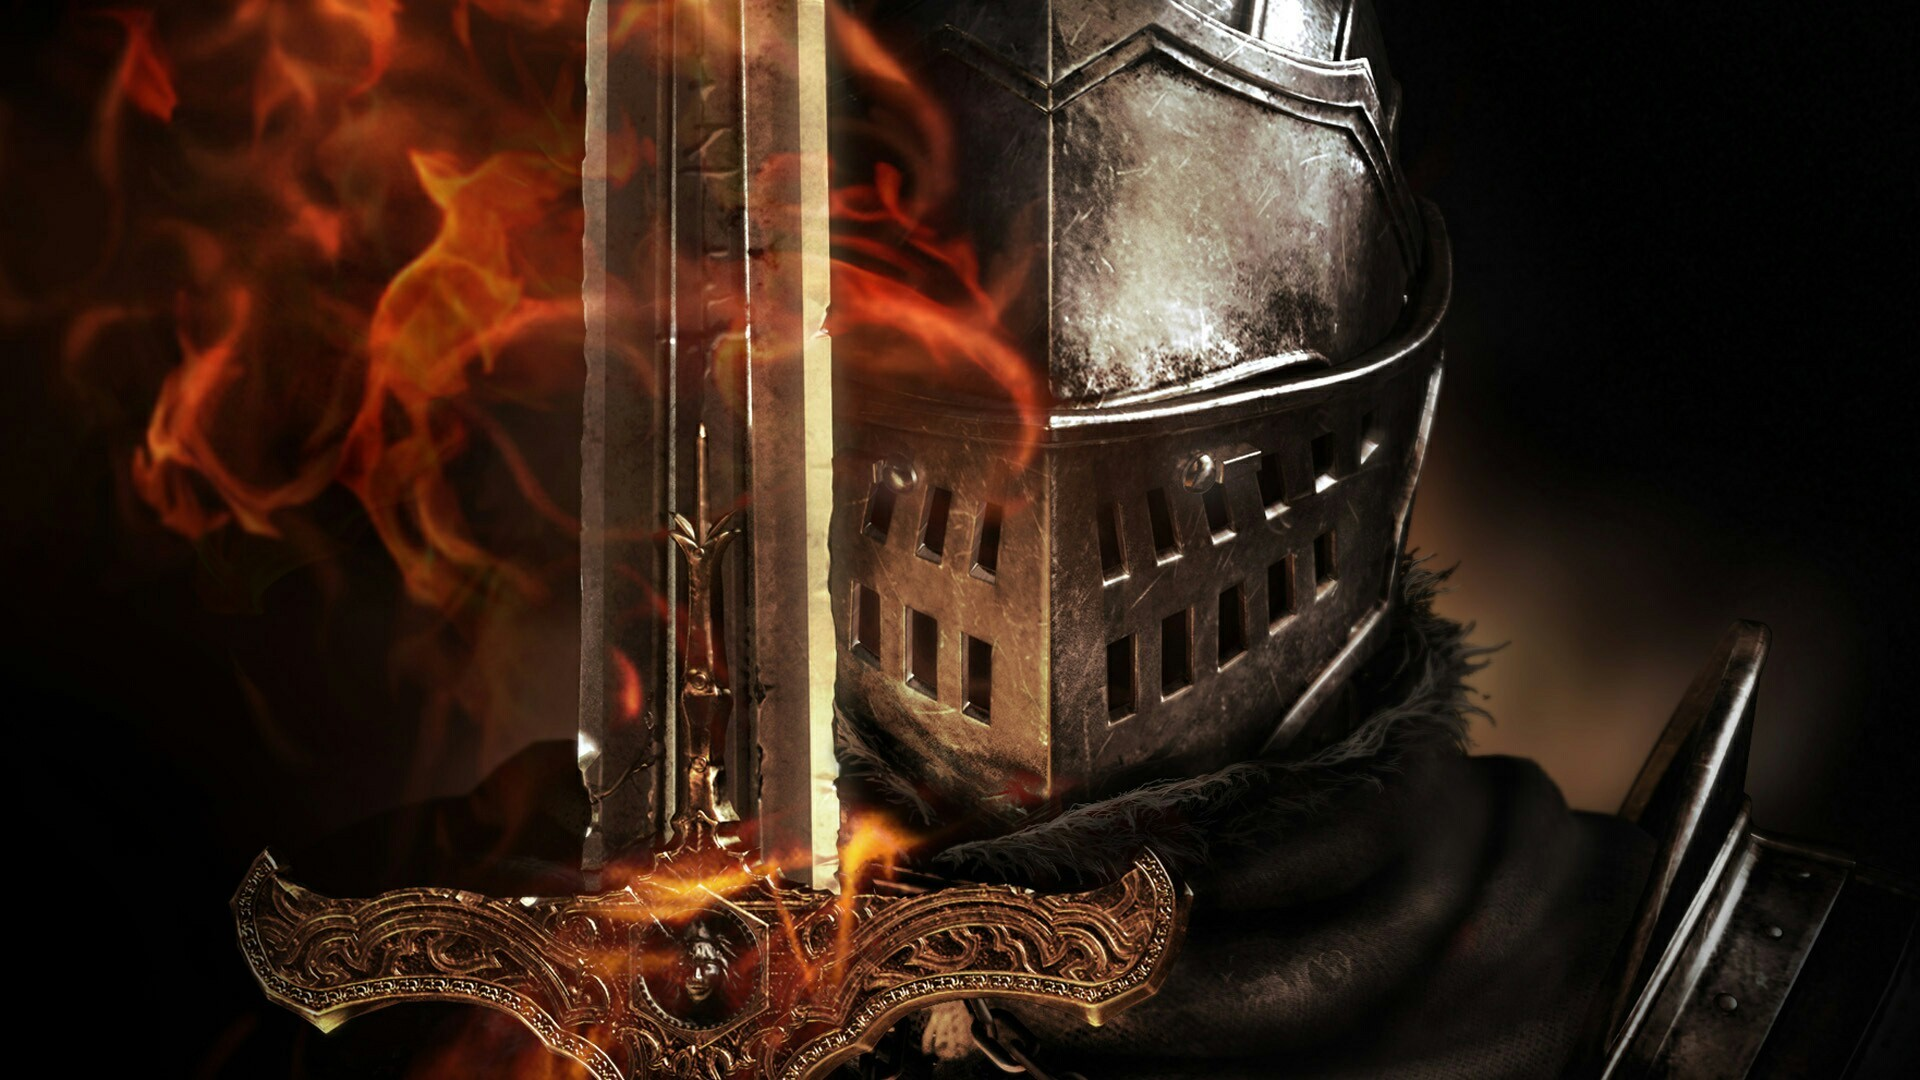 Title. Knight helmet with sword 1920x1080